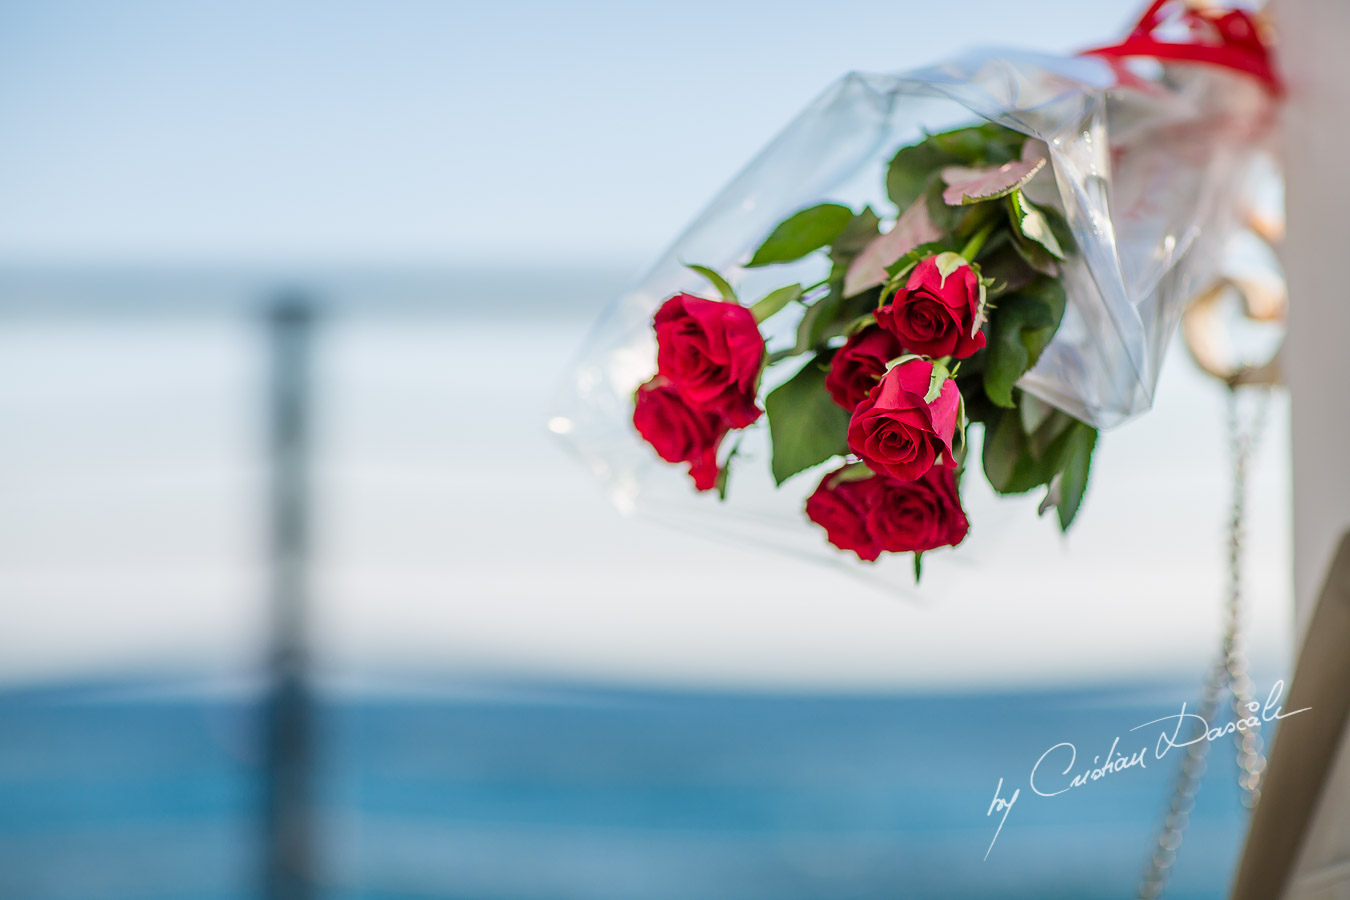 Beach Proposal Photo Session - 17